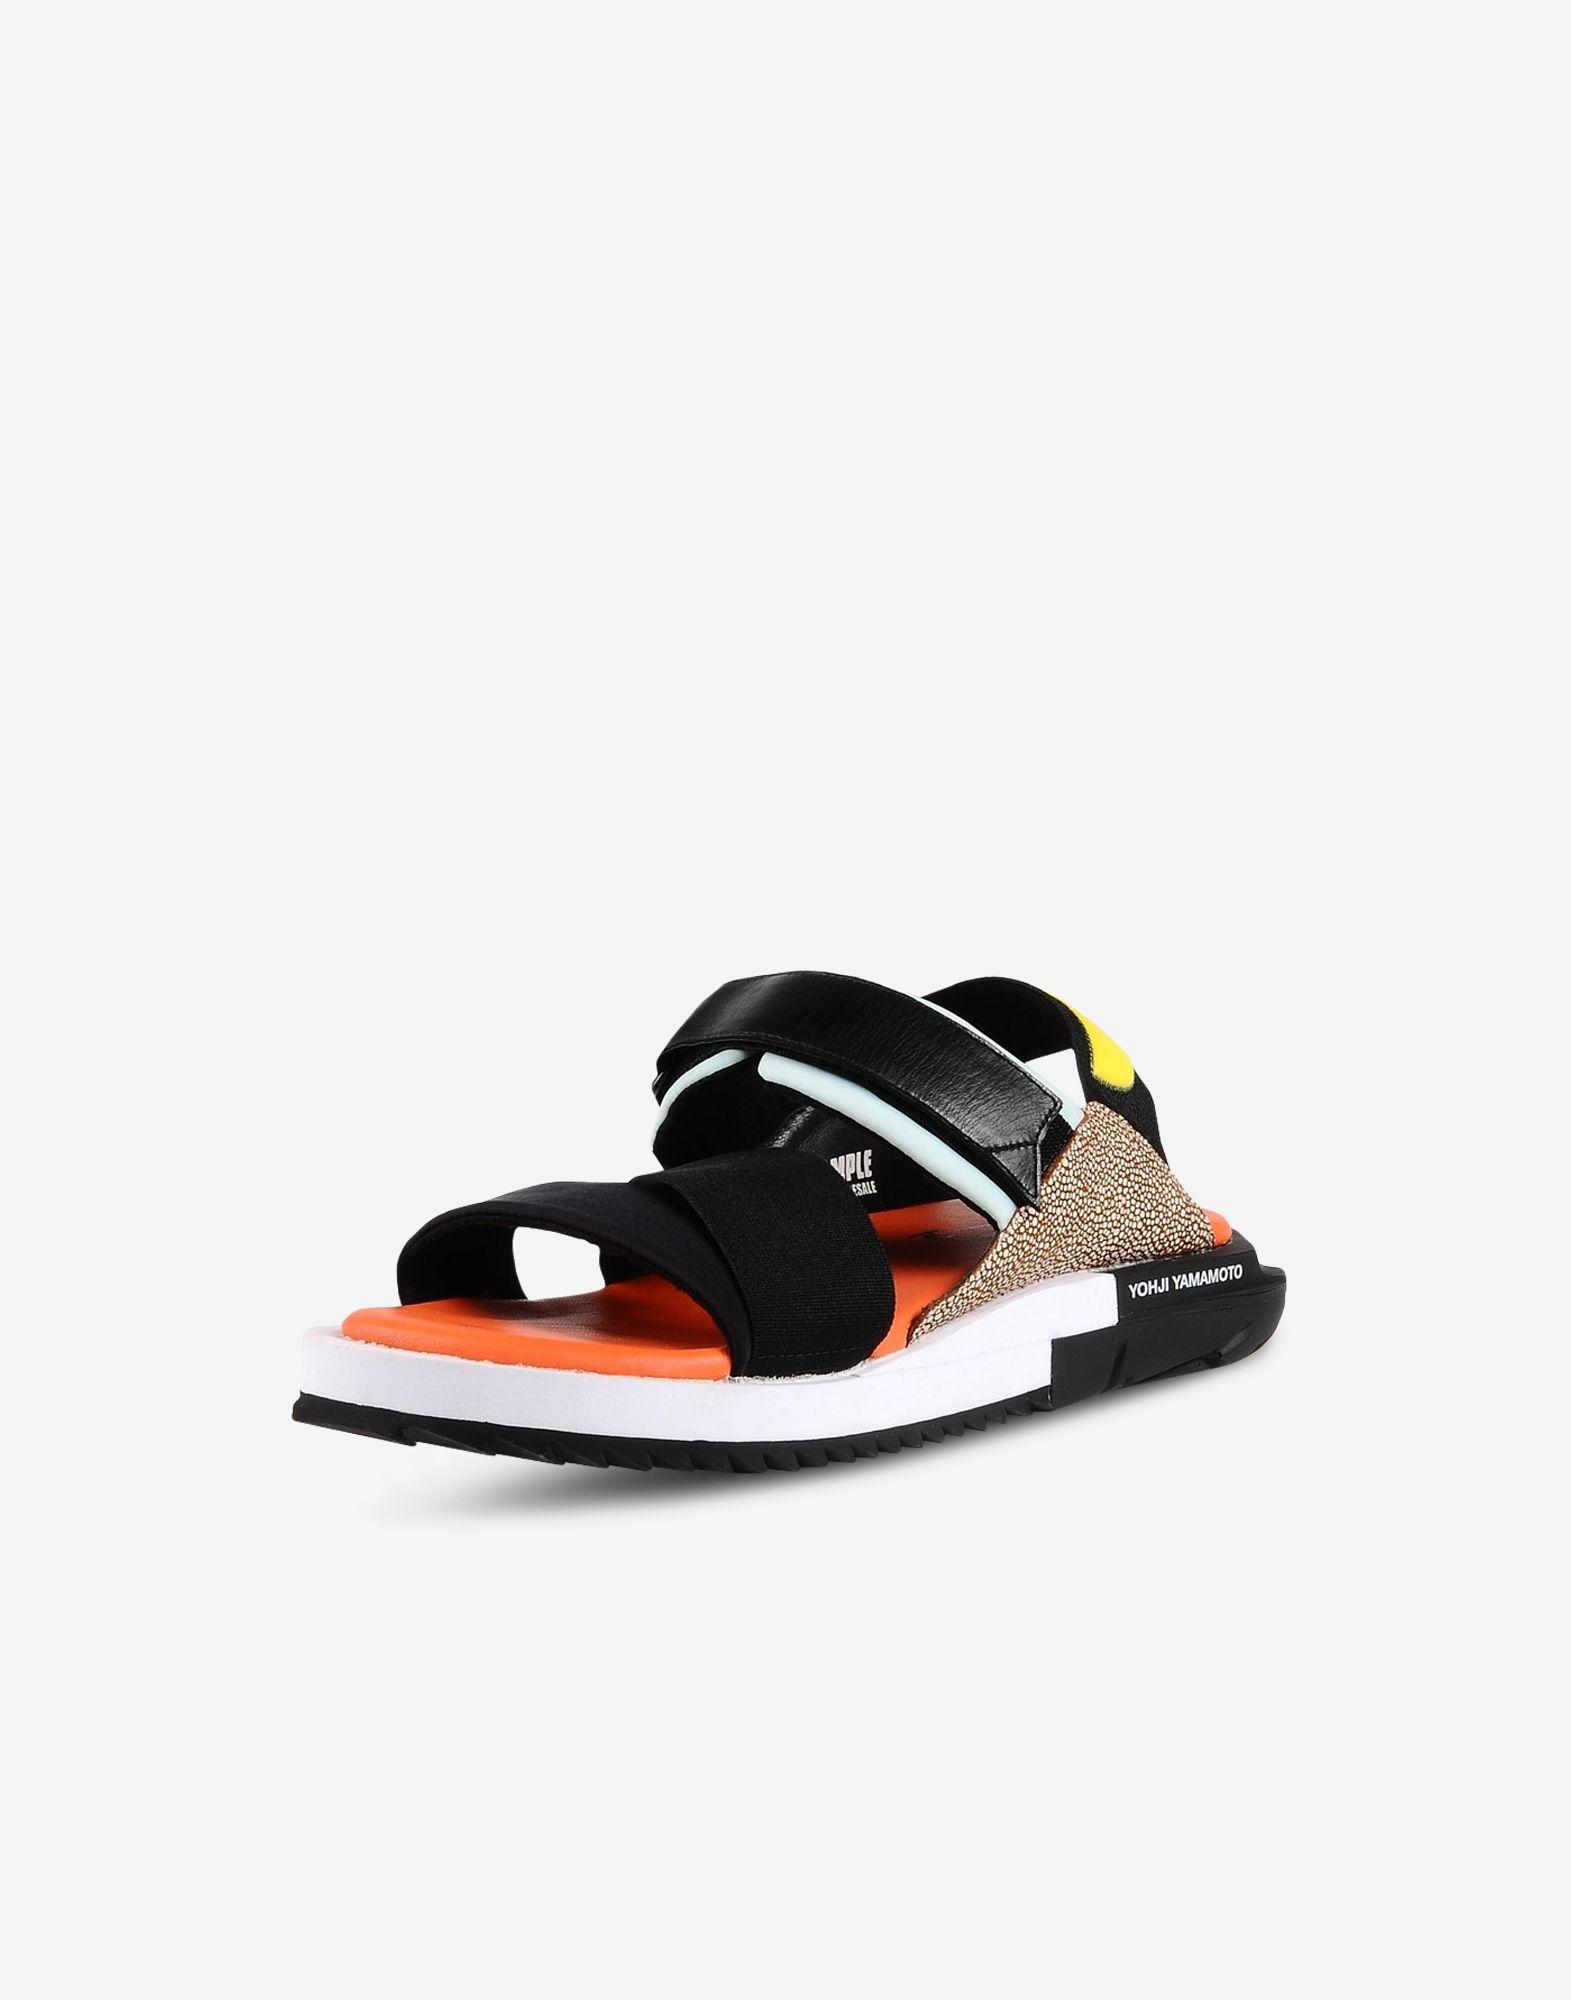 b937c1bf1 ... Y-3 Y-3 Kaohe Sandal Sandals Man ...